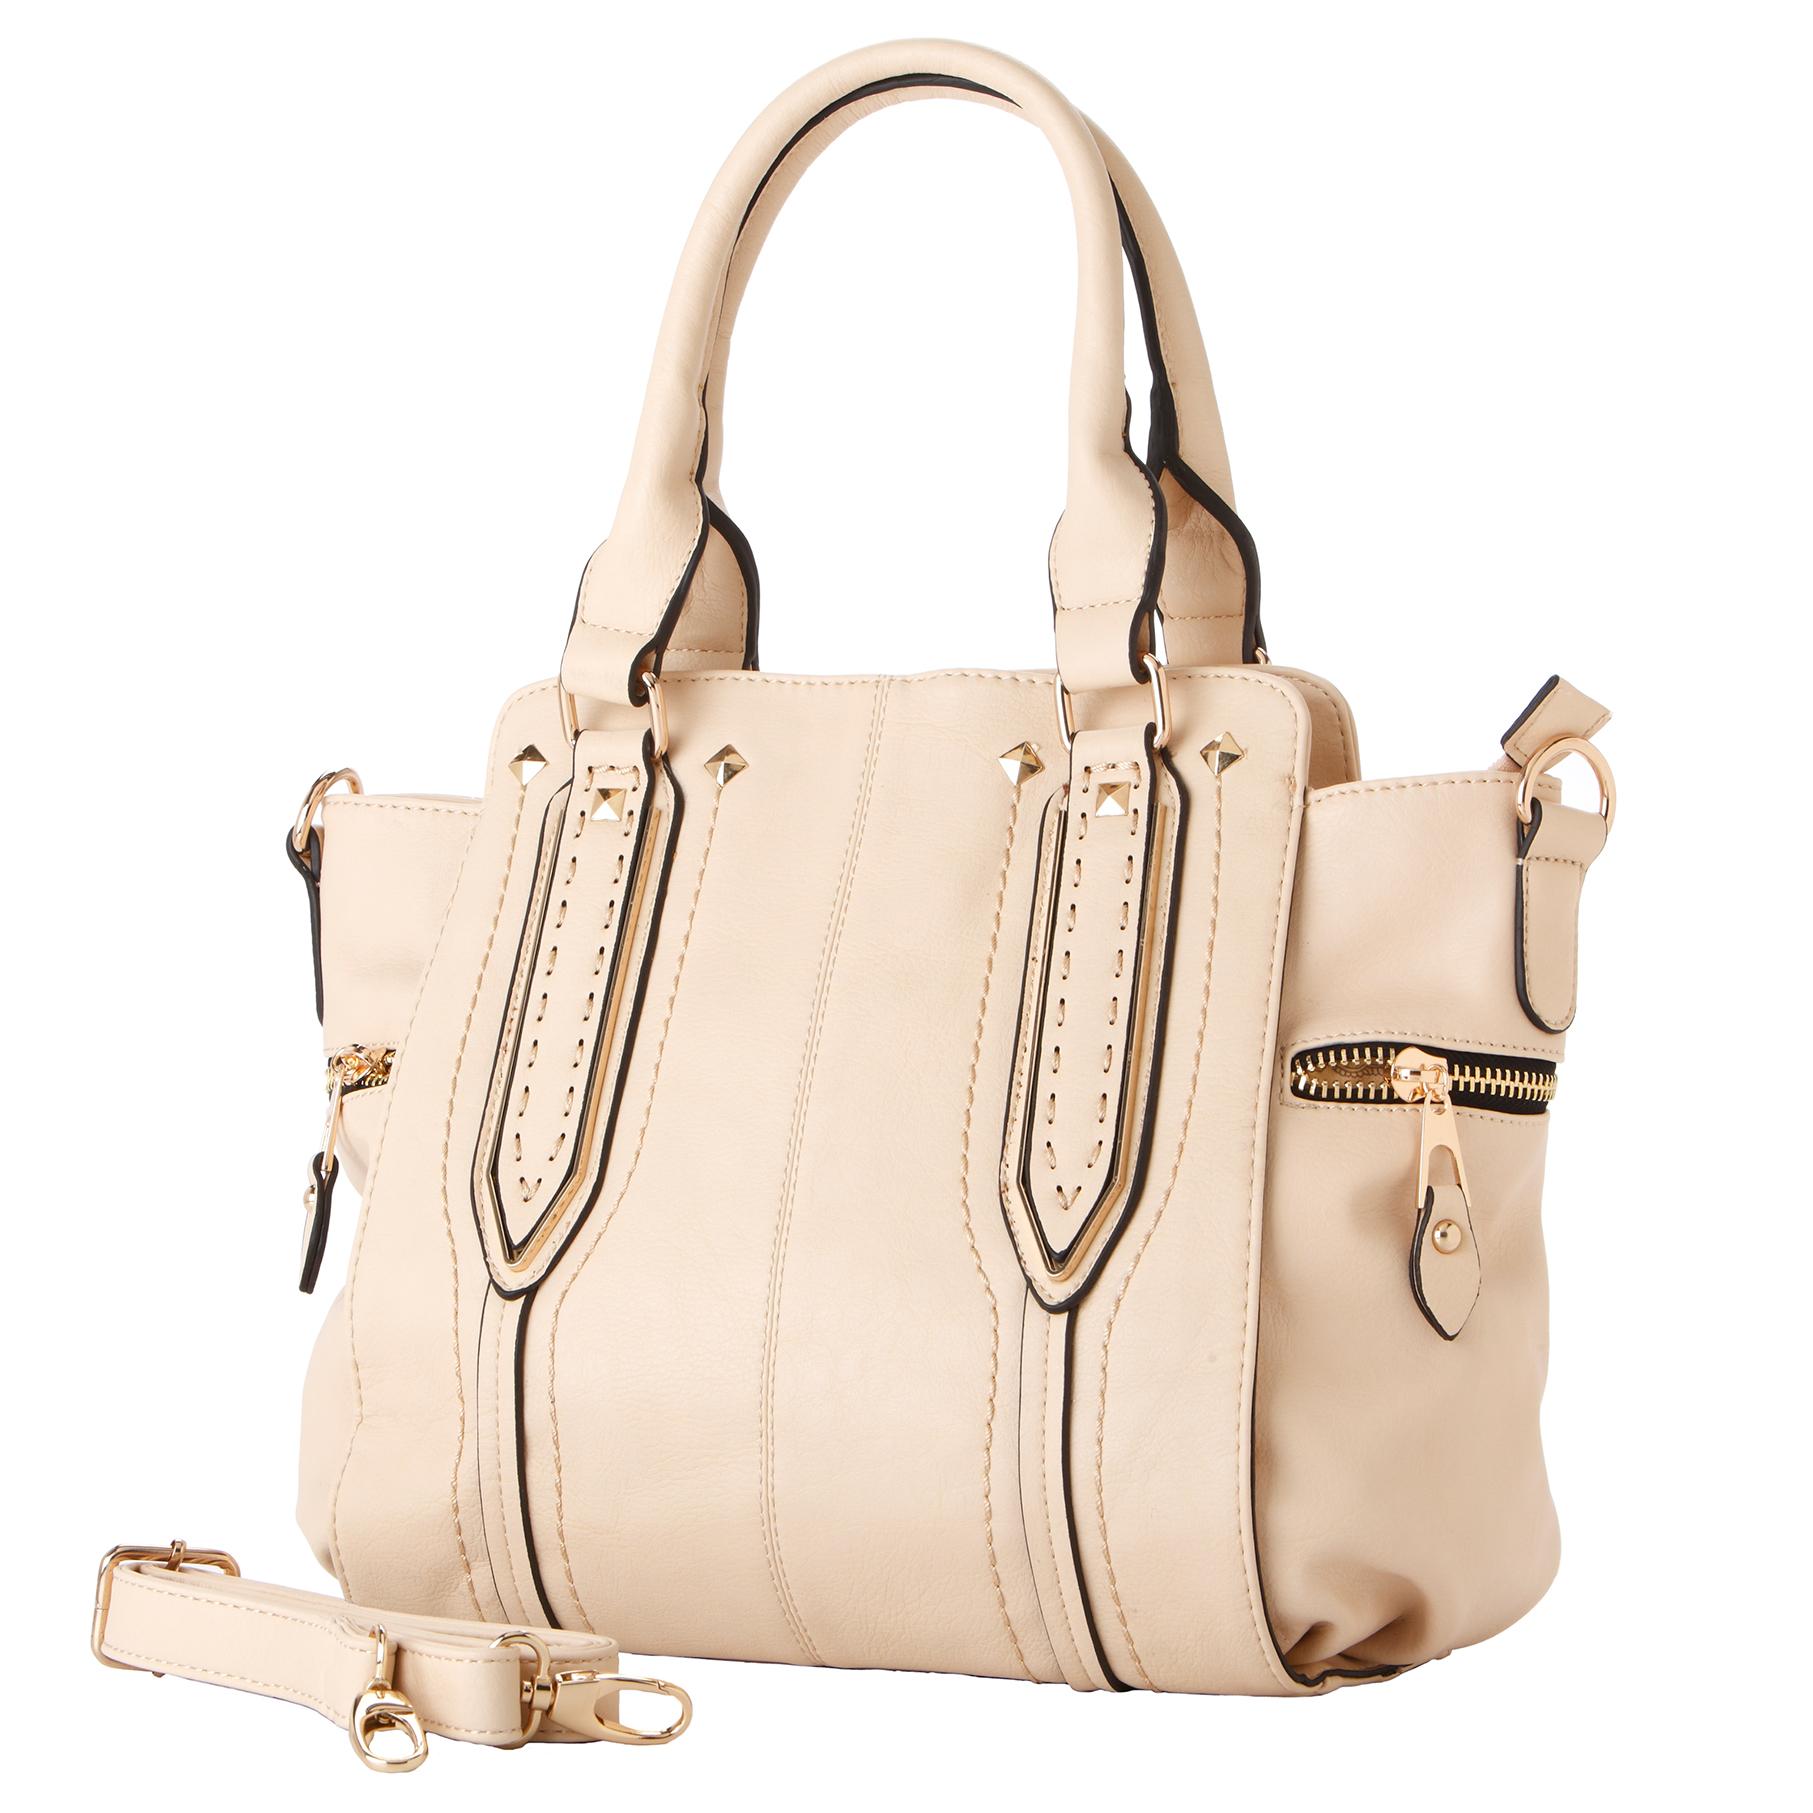 NORI Beige Top Handle Office Tote Style Satchel Handbag main